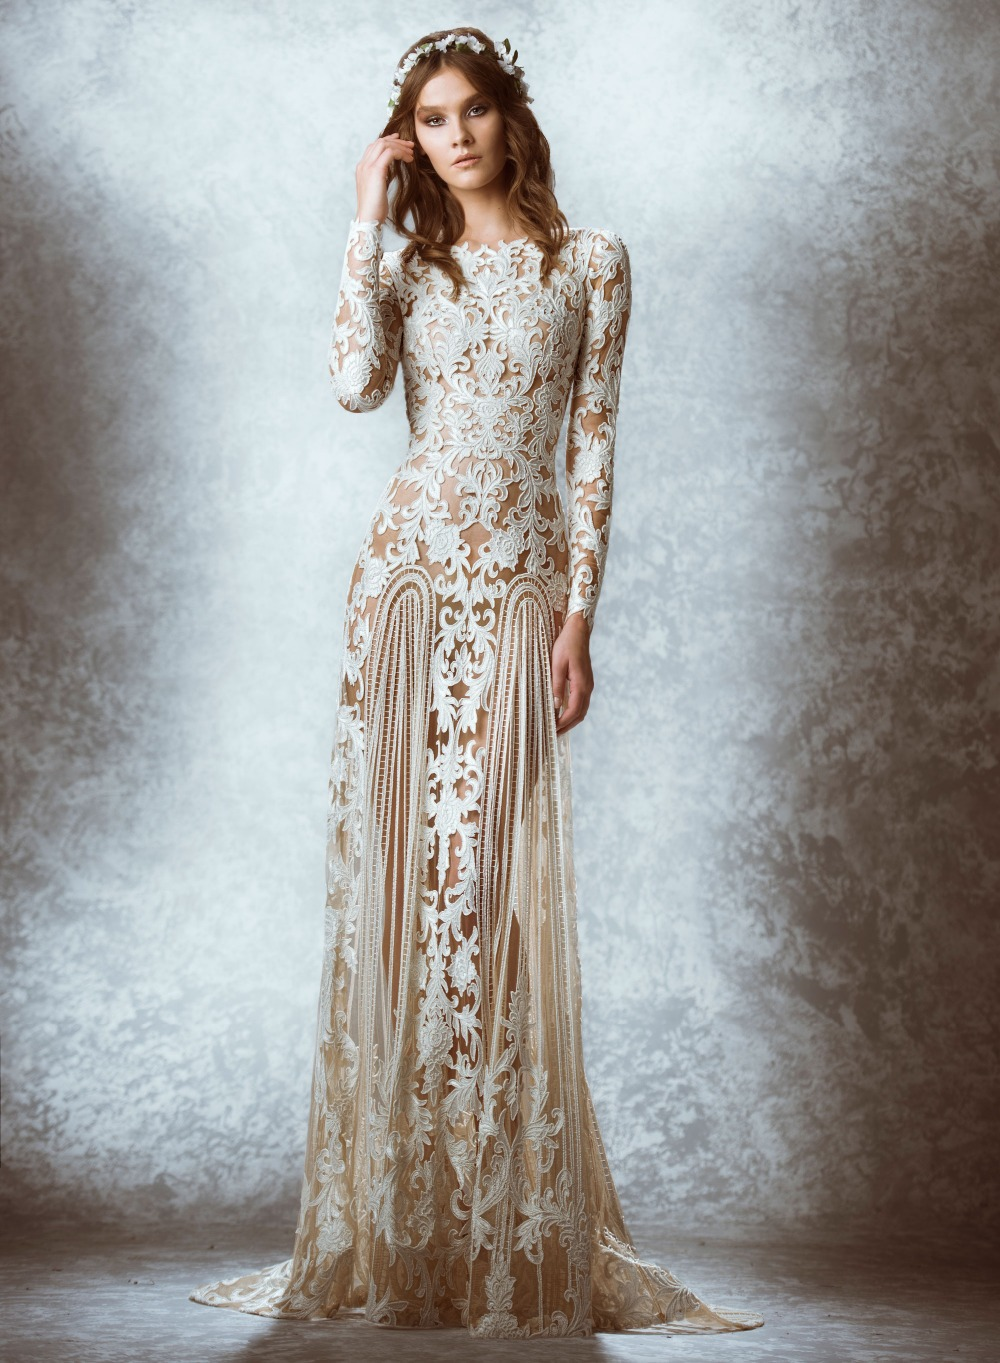 2015 Zuhair Murad Lace Vintage Wedding Dresses Long Sleeves Court ...